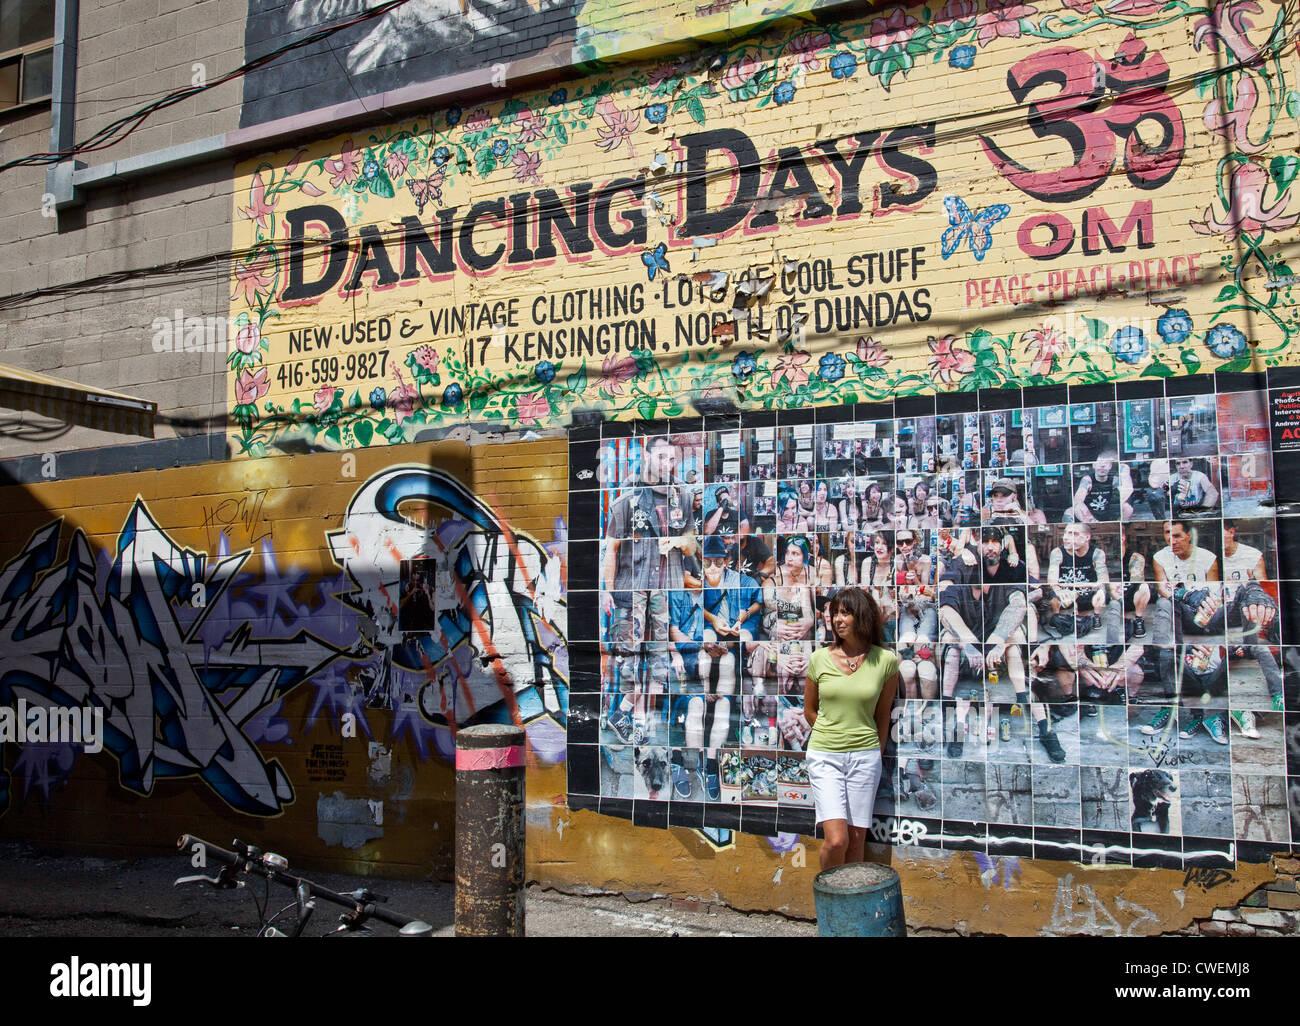 Graffiti wall toronto downtown - Graffiti Wall Toronto S Famous Historical Multicultural Kensington Market Near Spadian And Dundas Sts In Toronto Ontario Canada